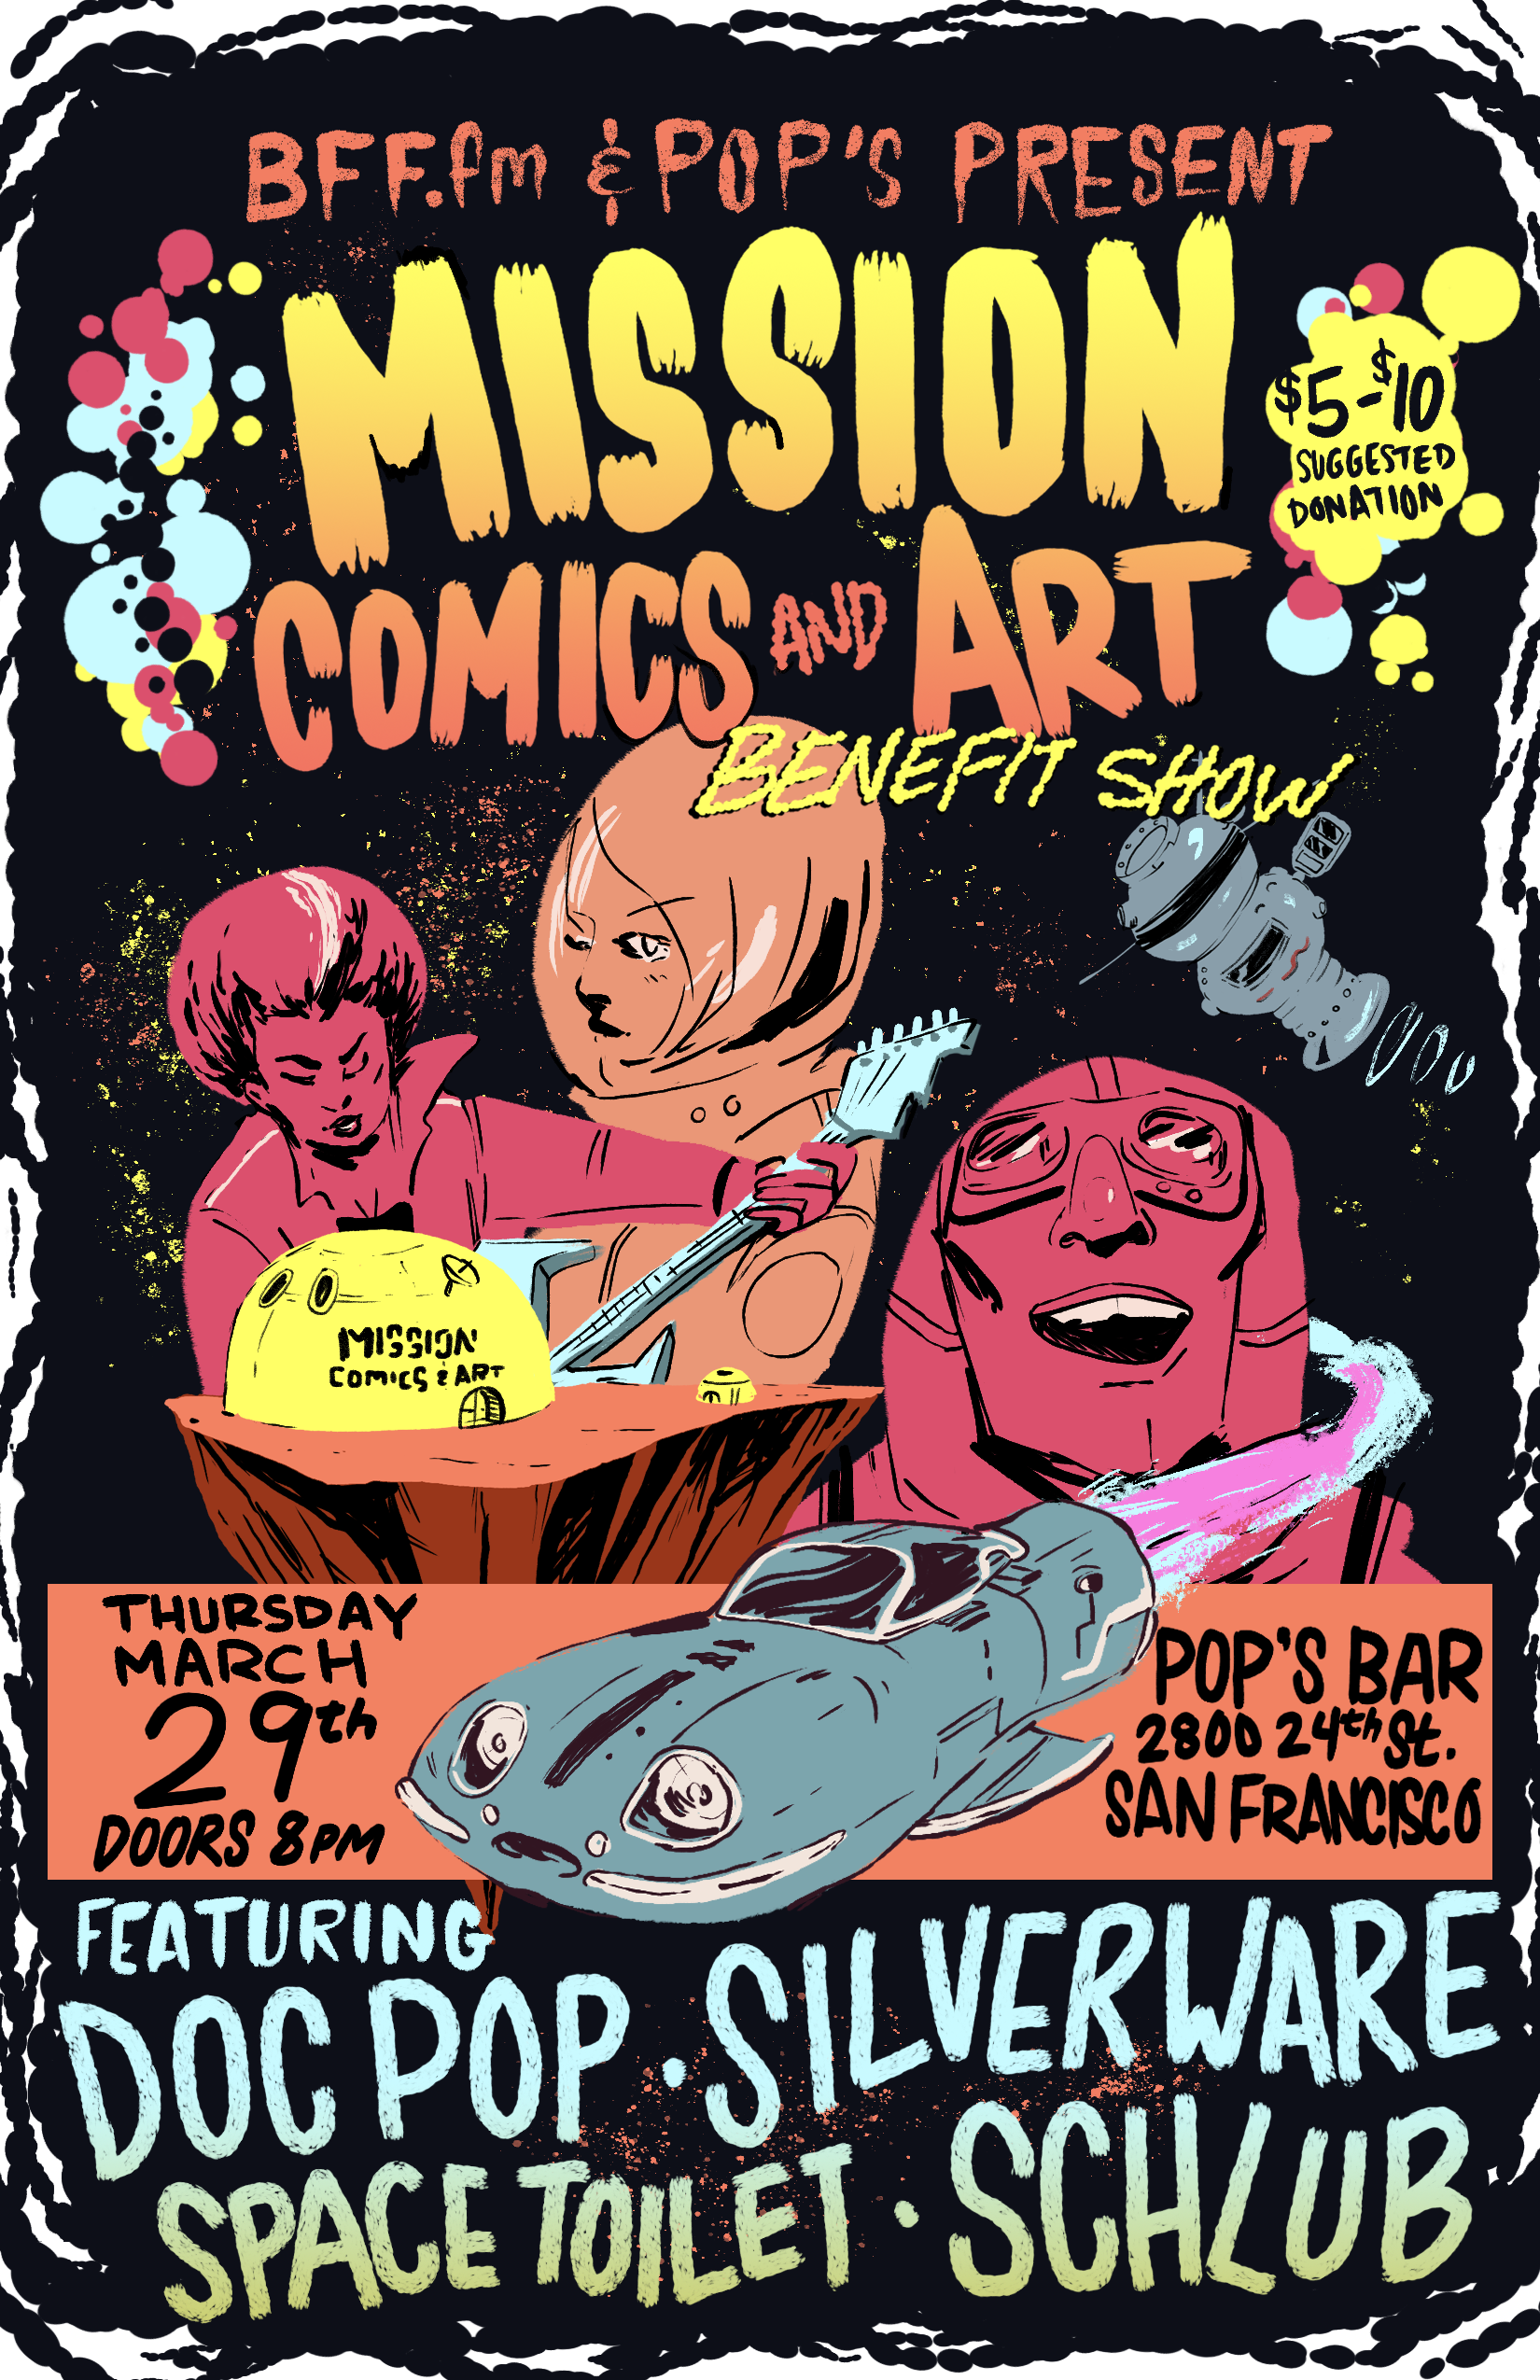 Mission Comics Benefit Show Poster